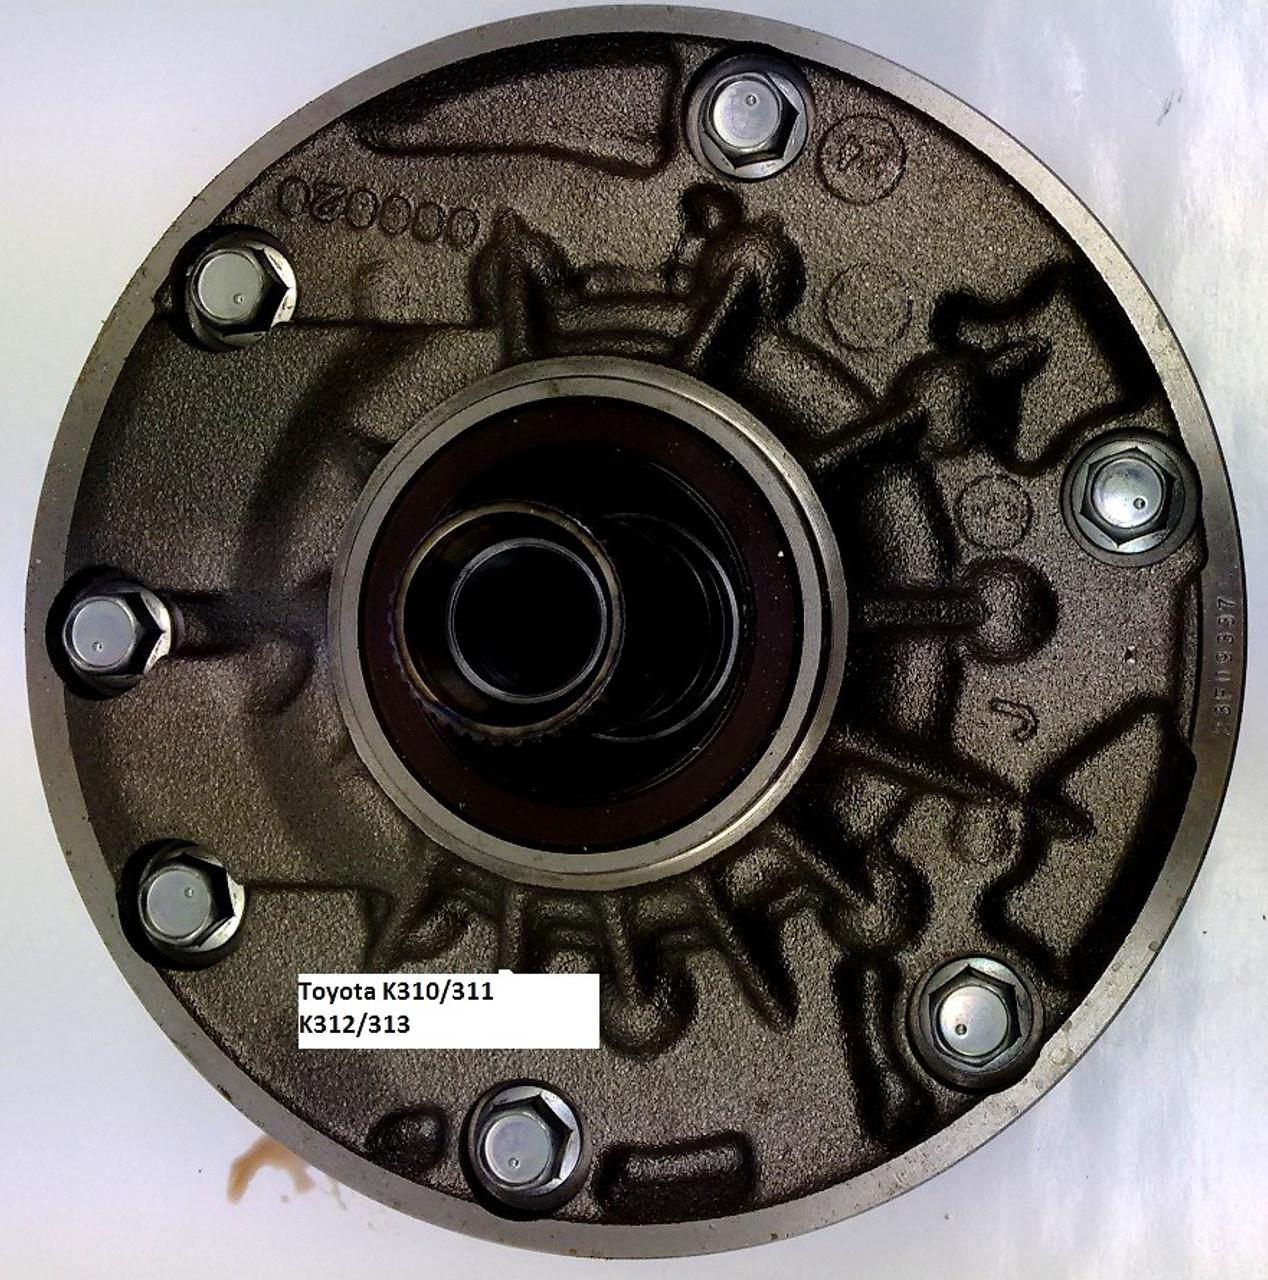 Oil Pump Toyota K310/311/312/313